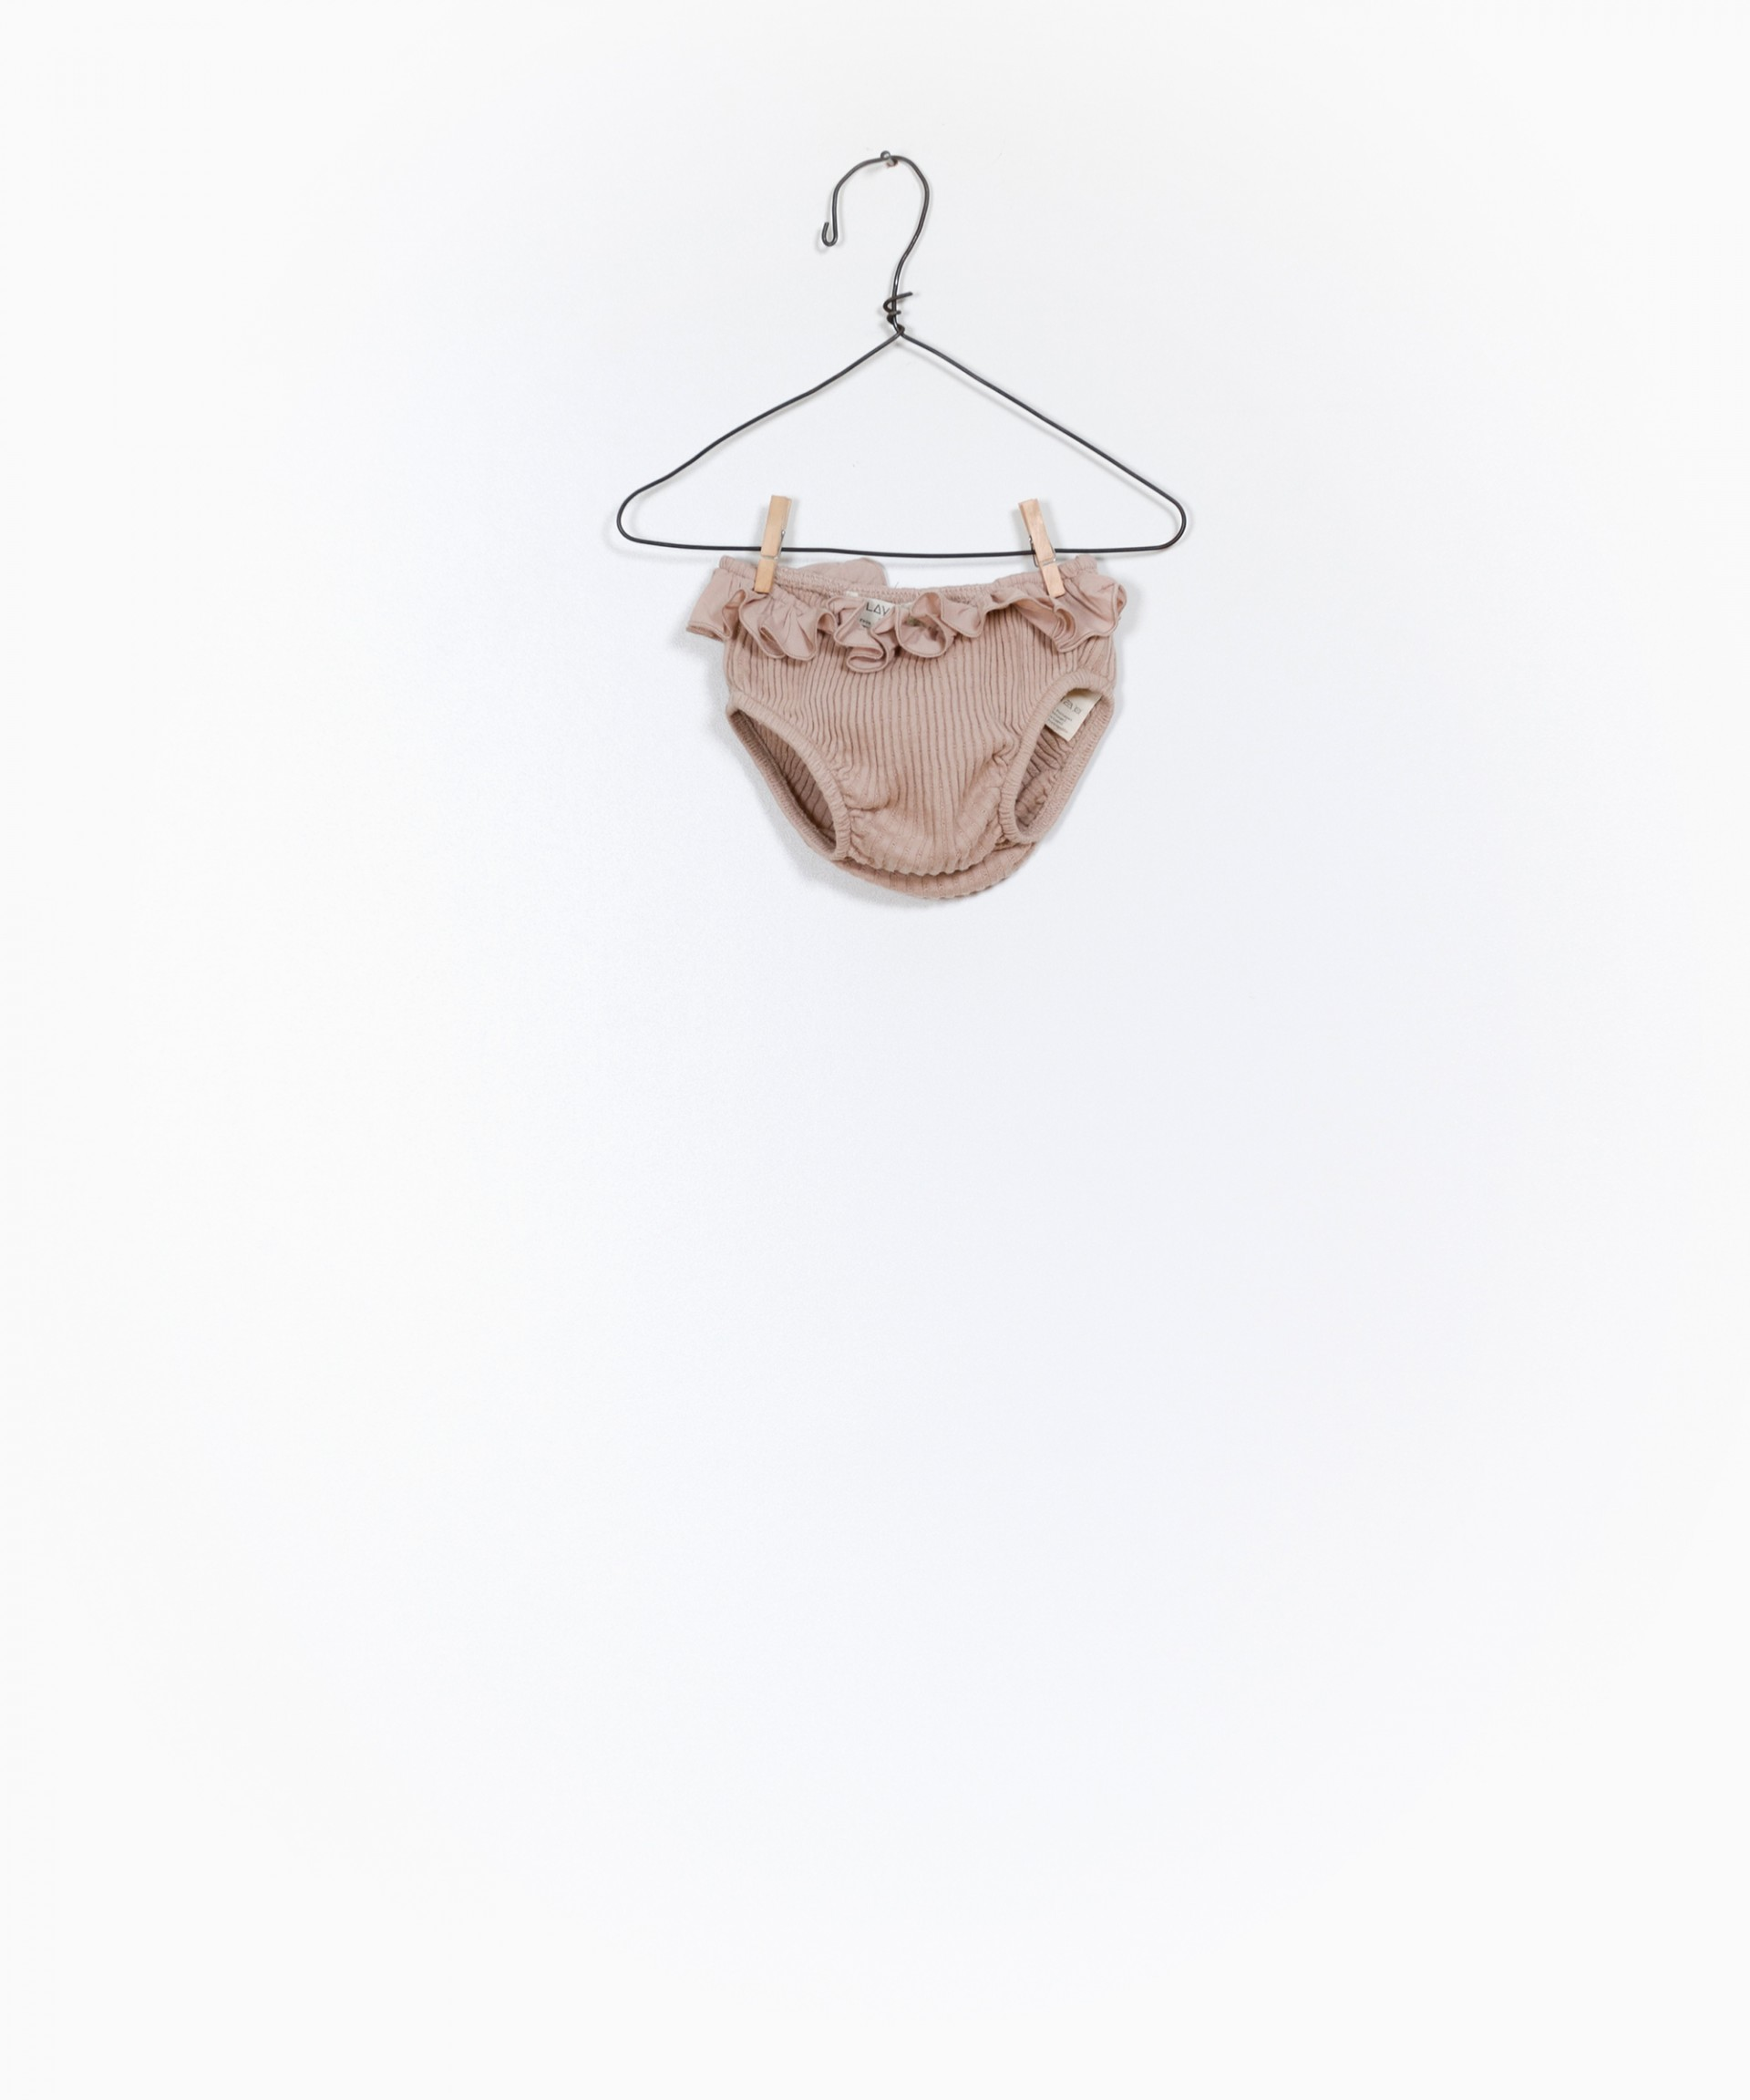 RIB Underpants